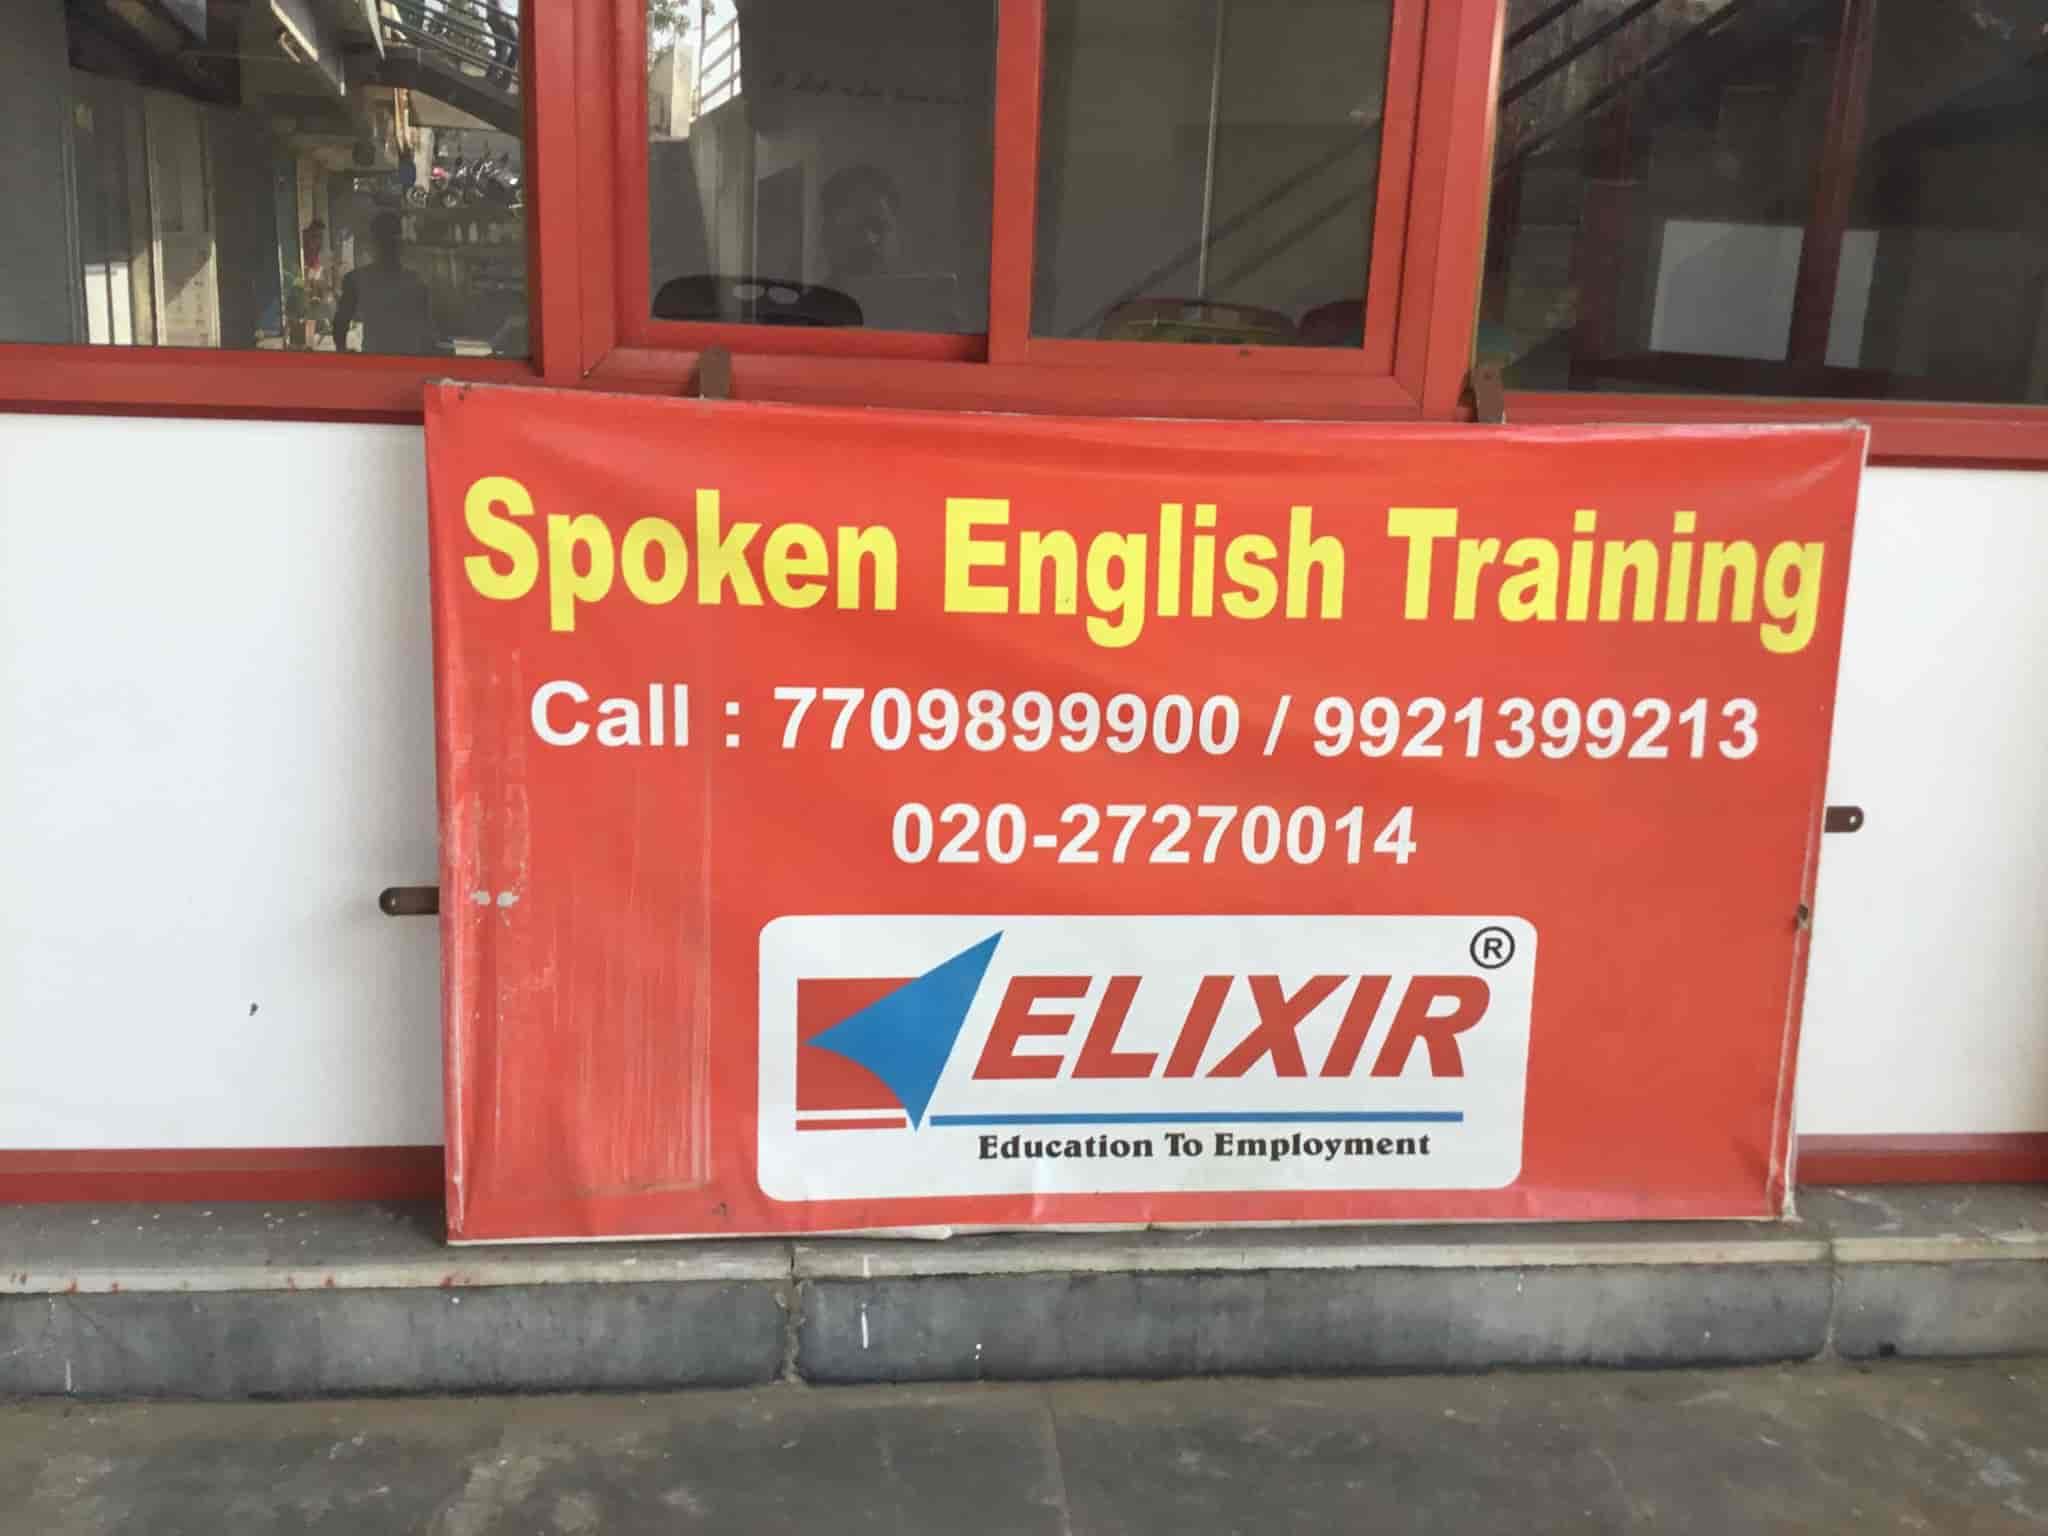 Elixir Training Services Pvt Ltd, Thergaon - Language